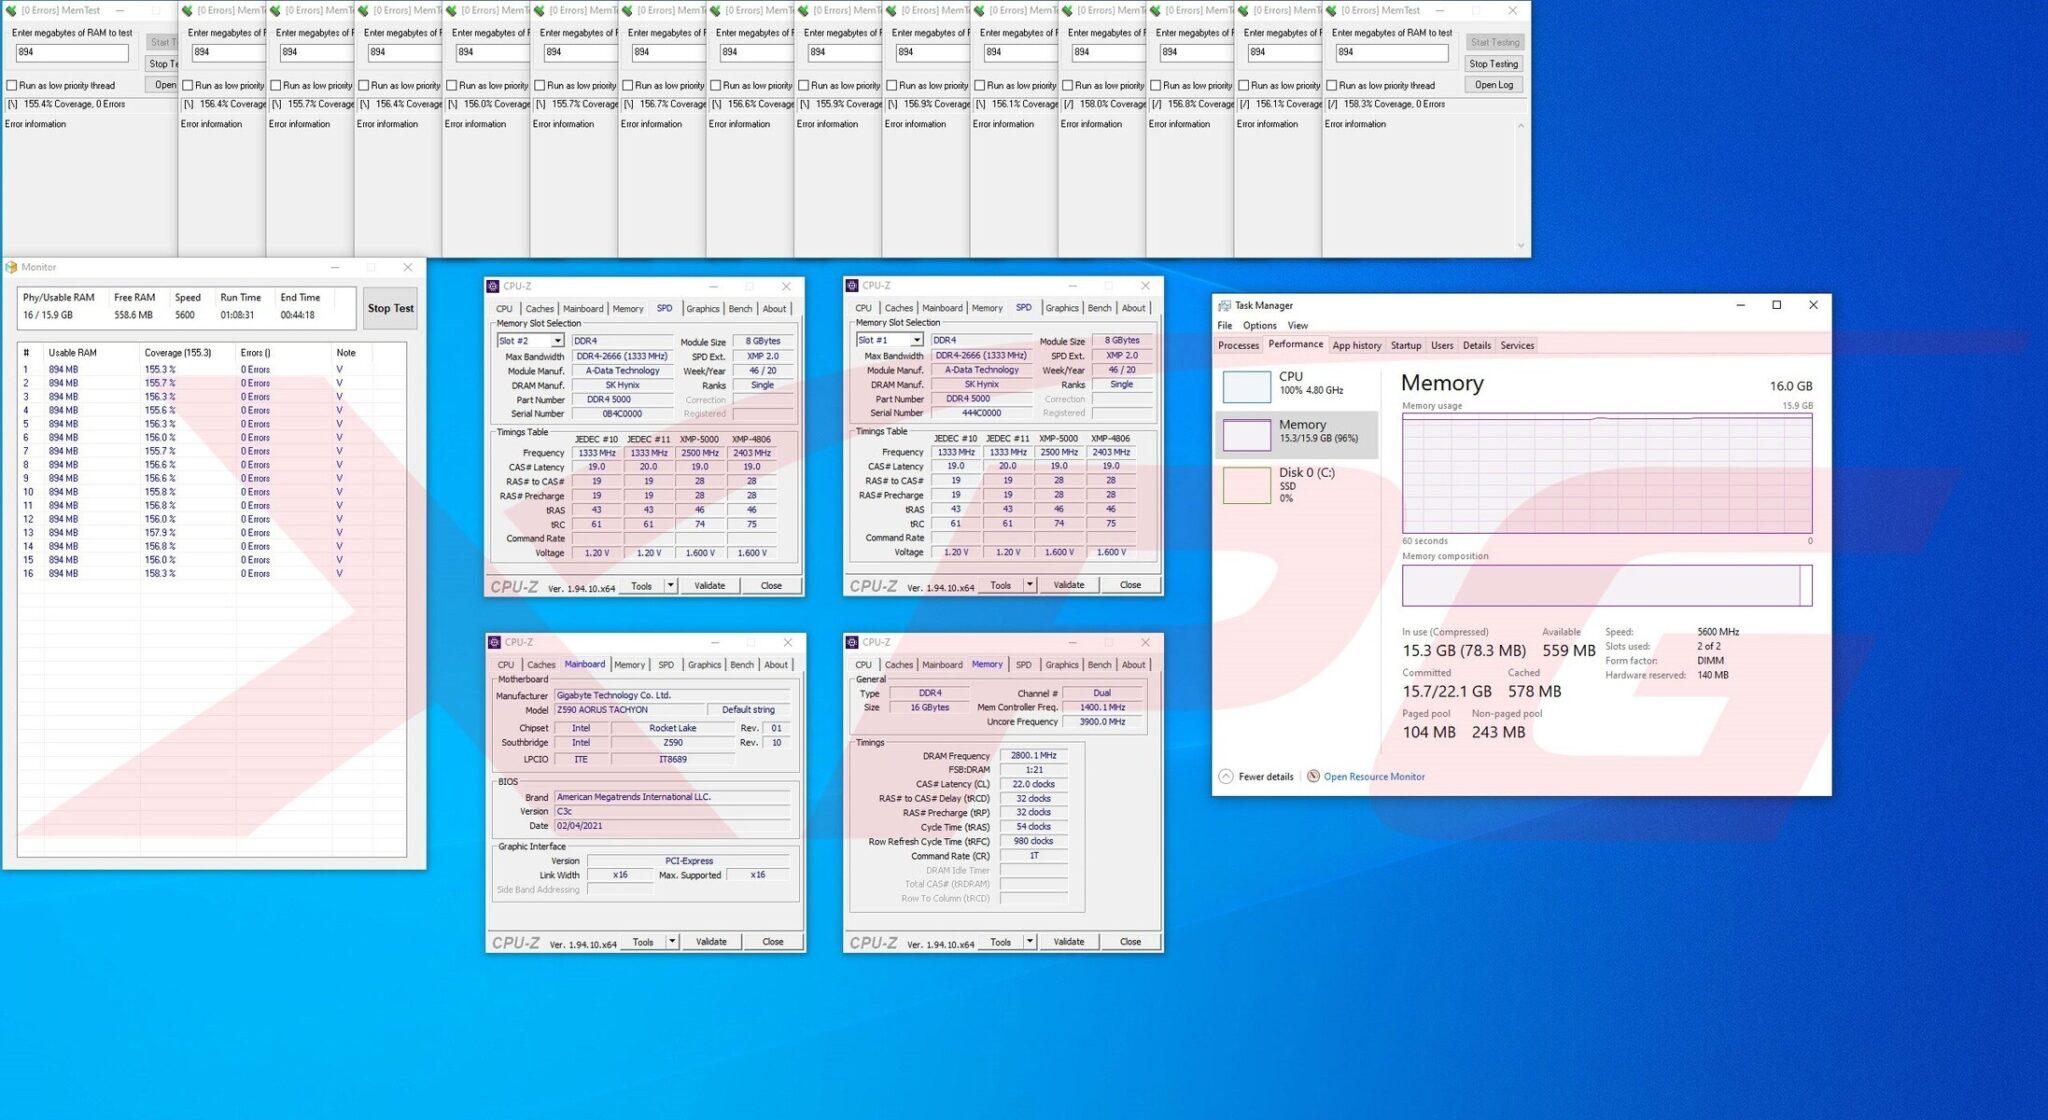 XPG Memory and SSD 02